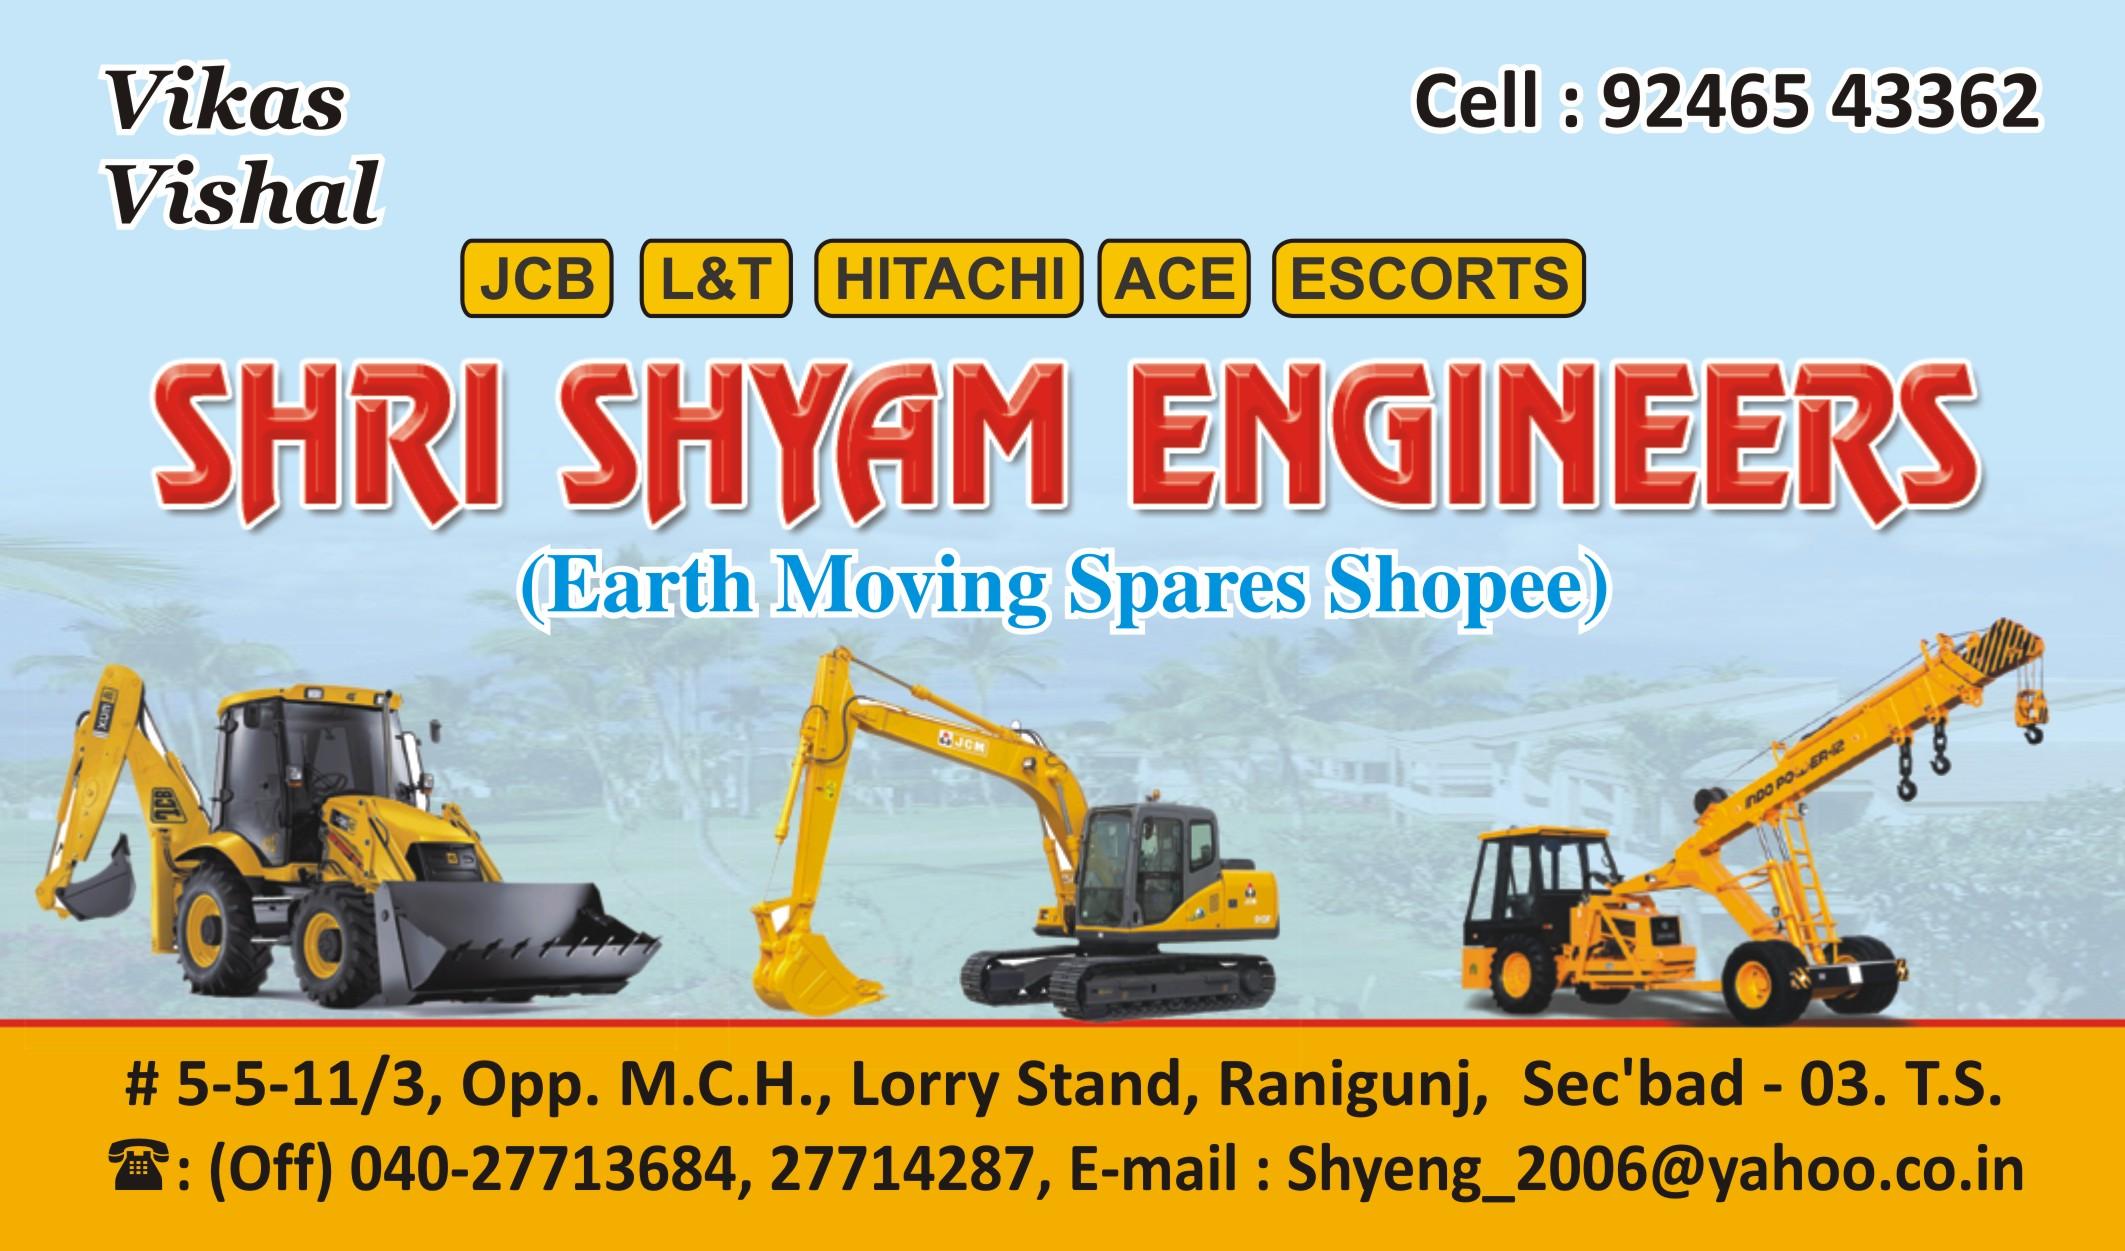 Shri Shyam Engineers